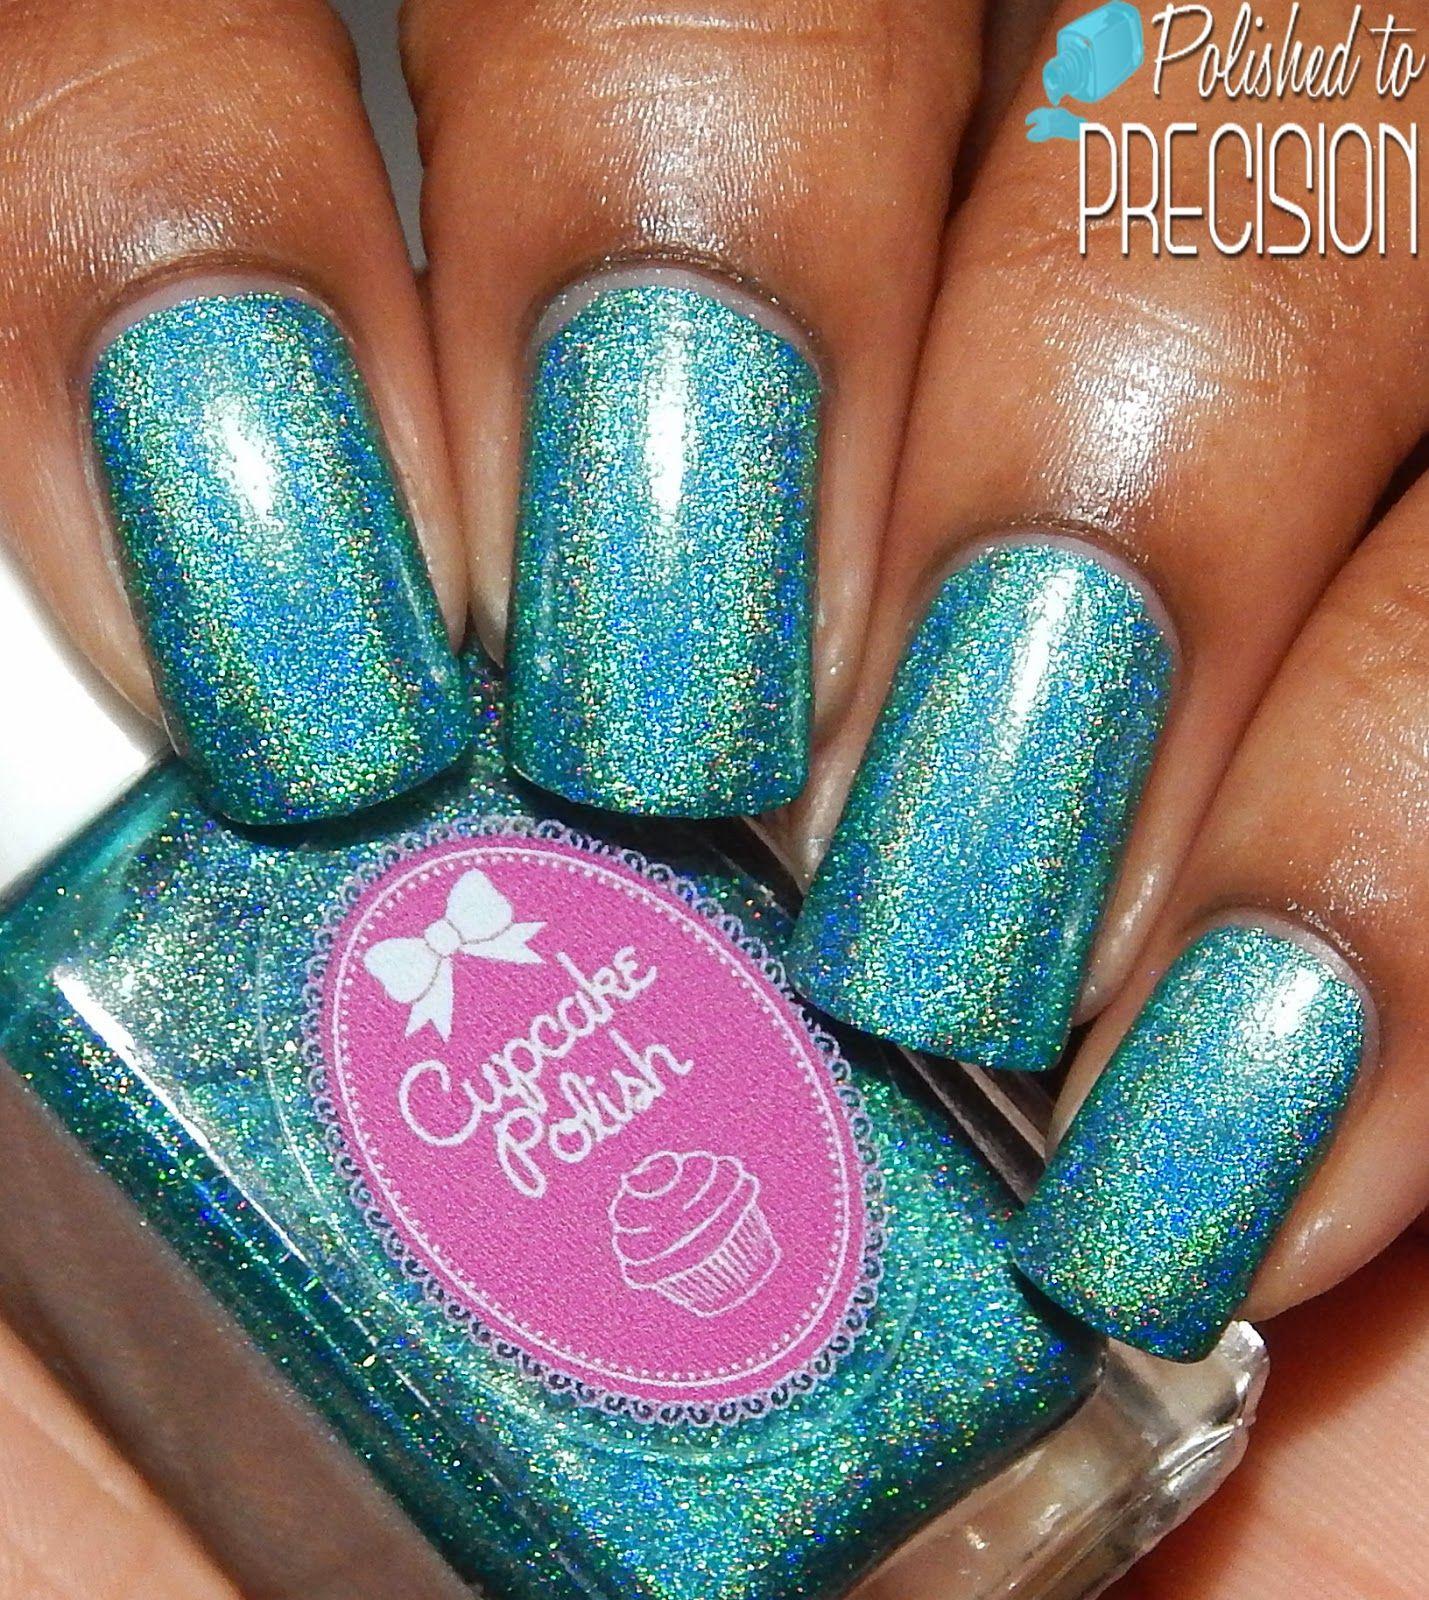 Cupcake Polish Topsy Turvy ❤ http://ibeautyoutlet.com/ | nails ...